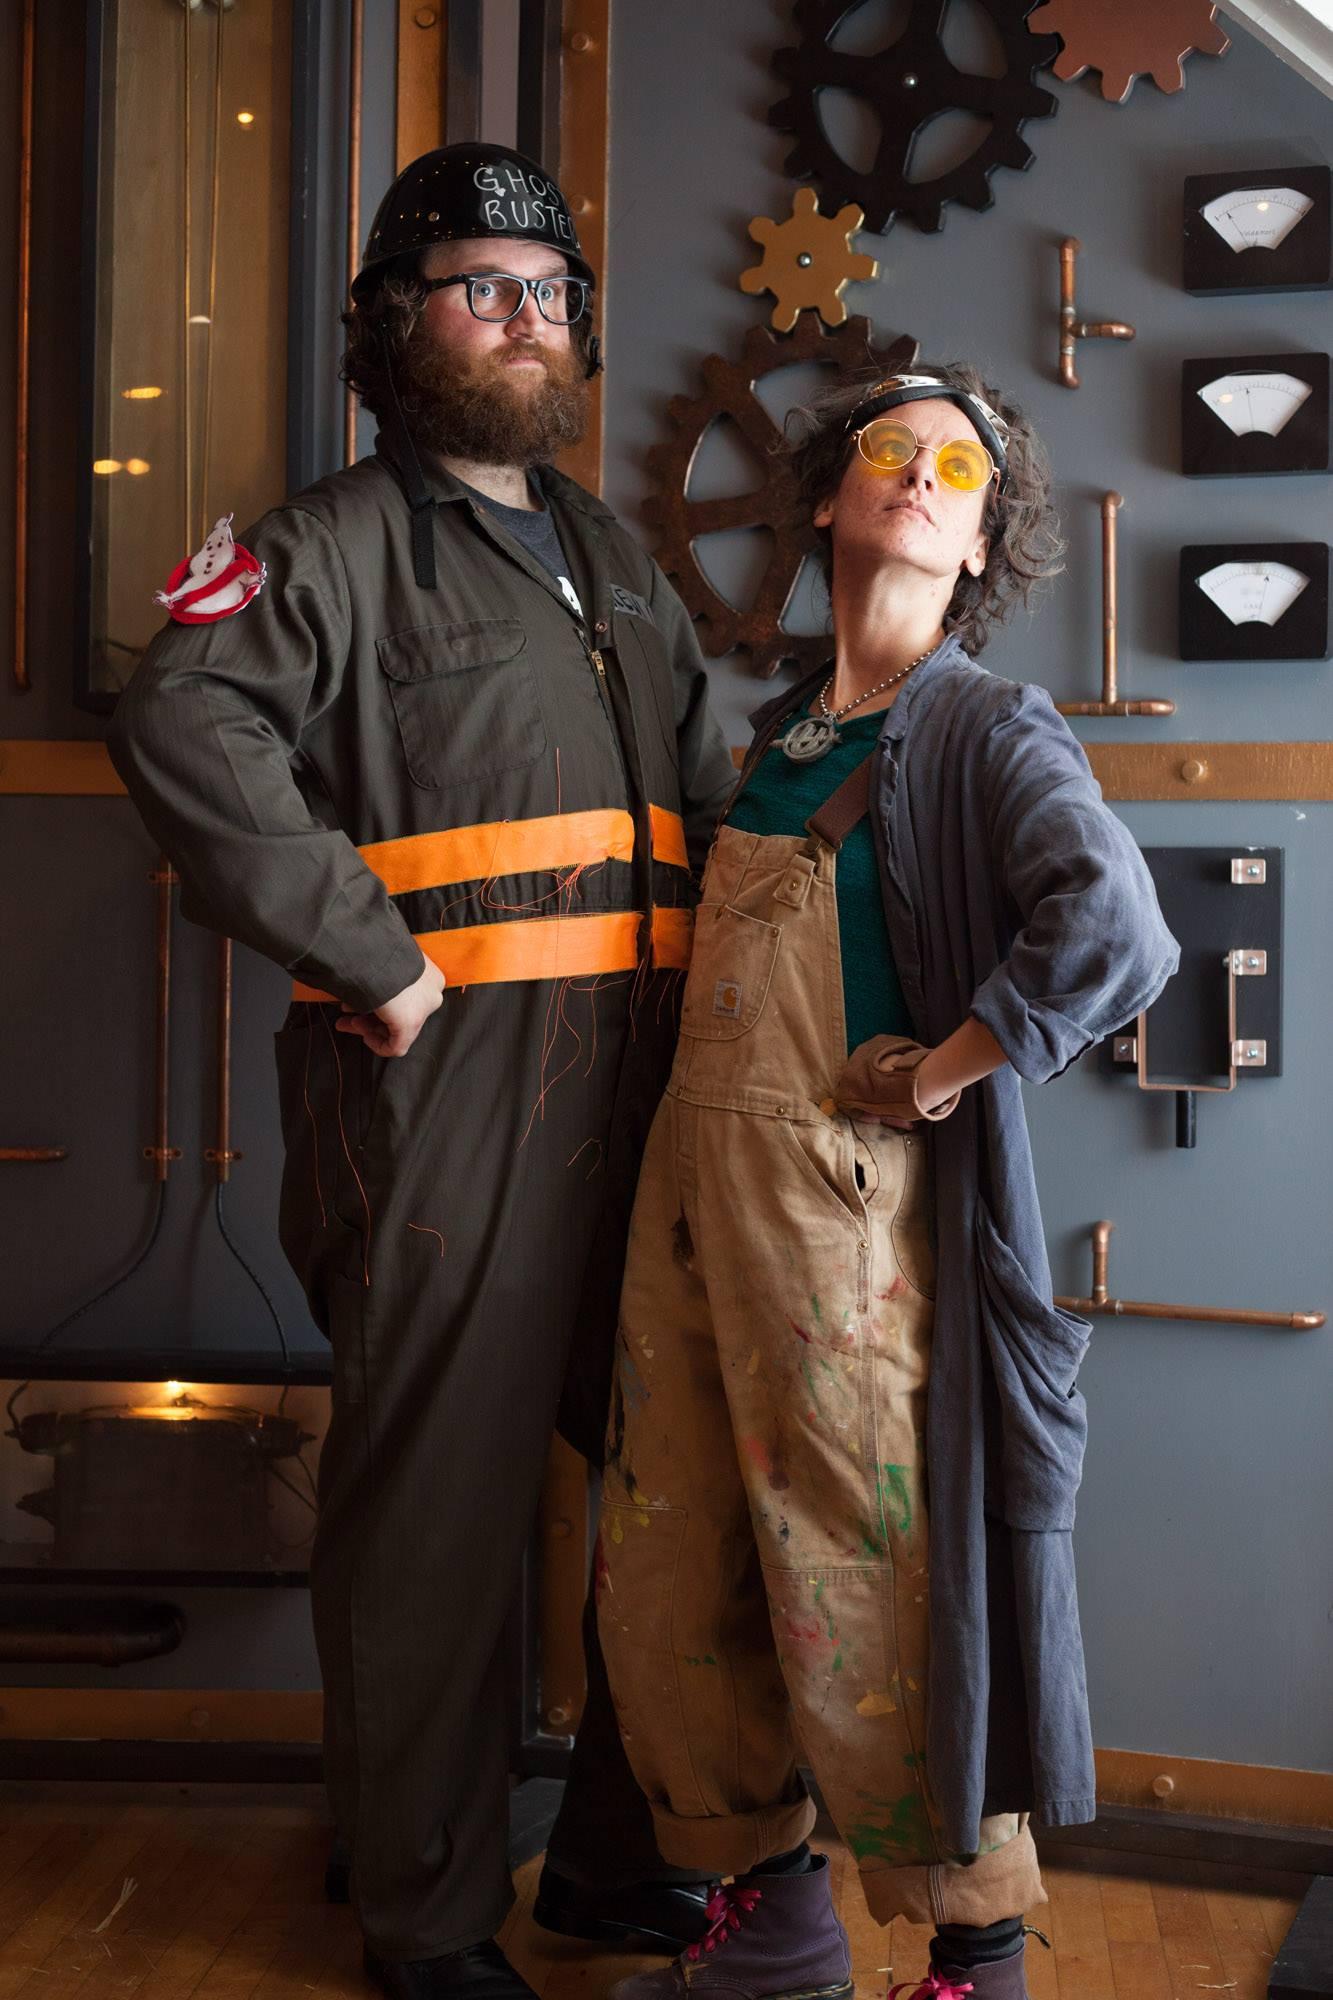 Michael & Kathryn at Monster Mash 2016 Photo by Joe Menth, Fine Balance Imaging + Printing